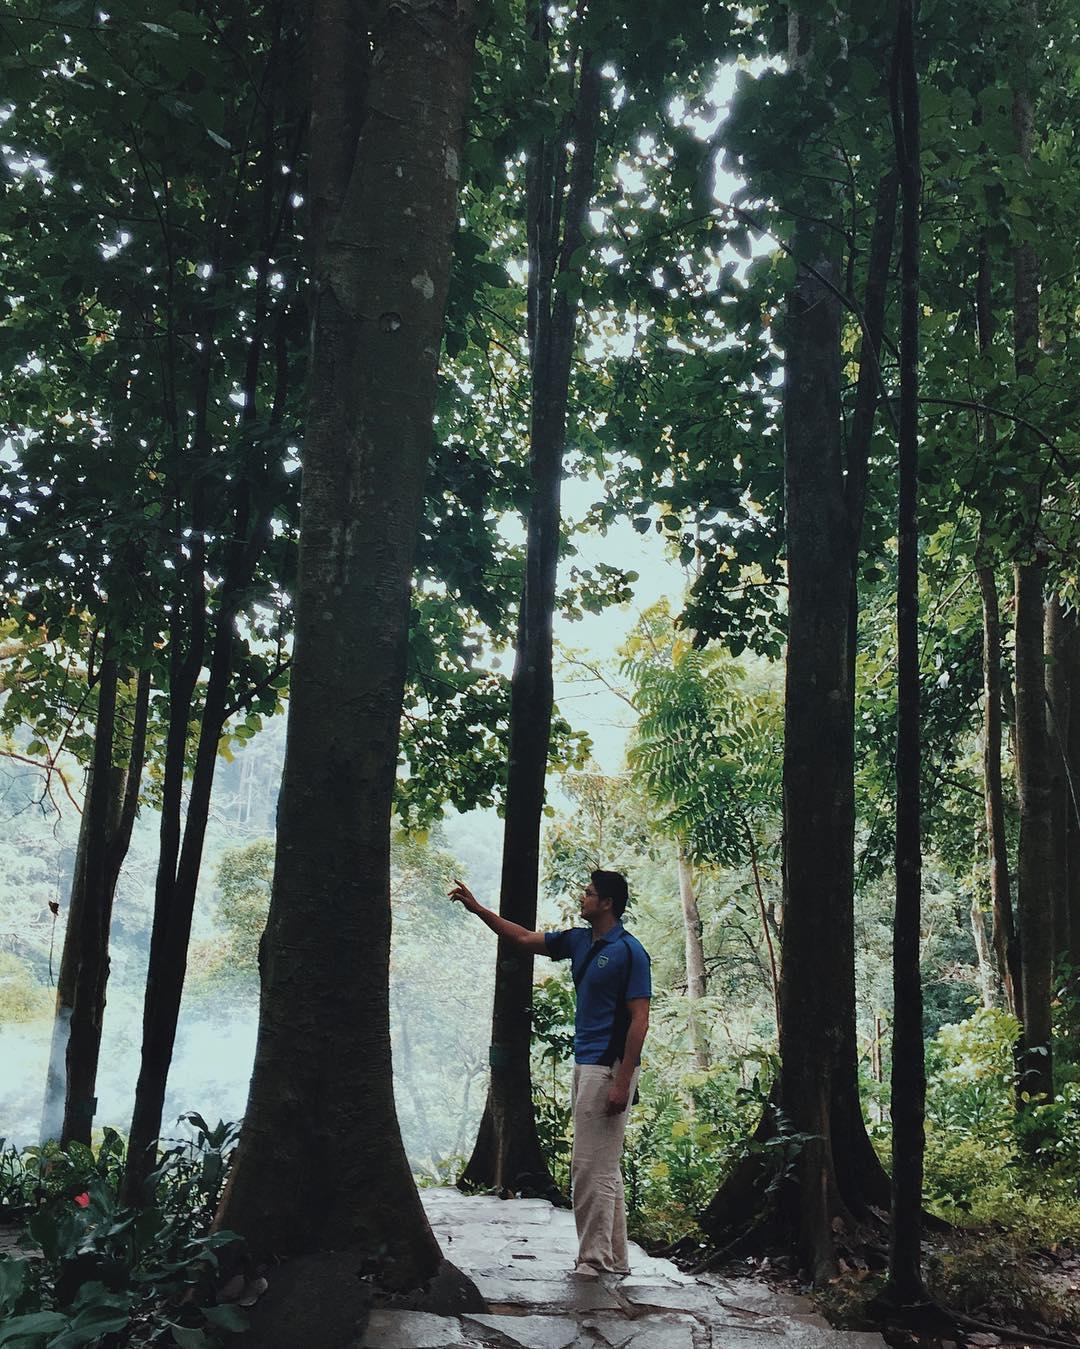 Taman Hutan Raya Ir H Djuanda, Taman Hutan Raya Bandung, Bandung, Dolan Dolen, Dolaners Taman Hutan Raya Ir H Djuanda by sayasenangjalan - Dolan Dolen